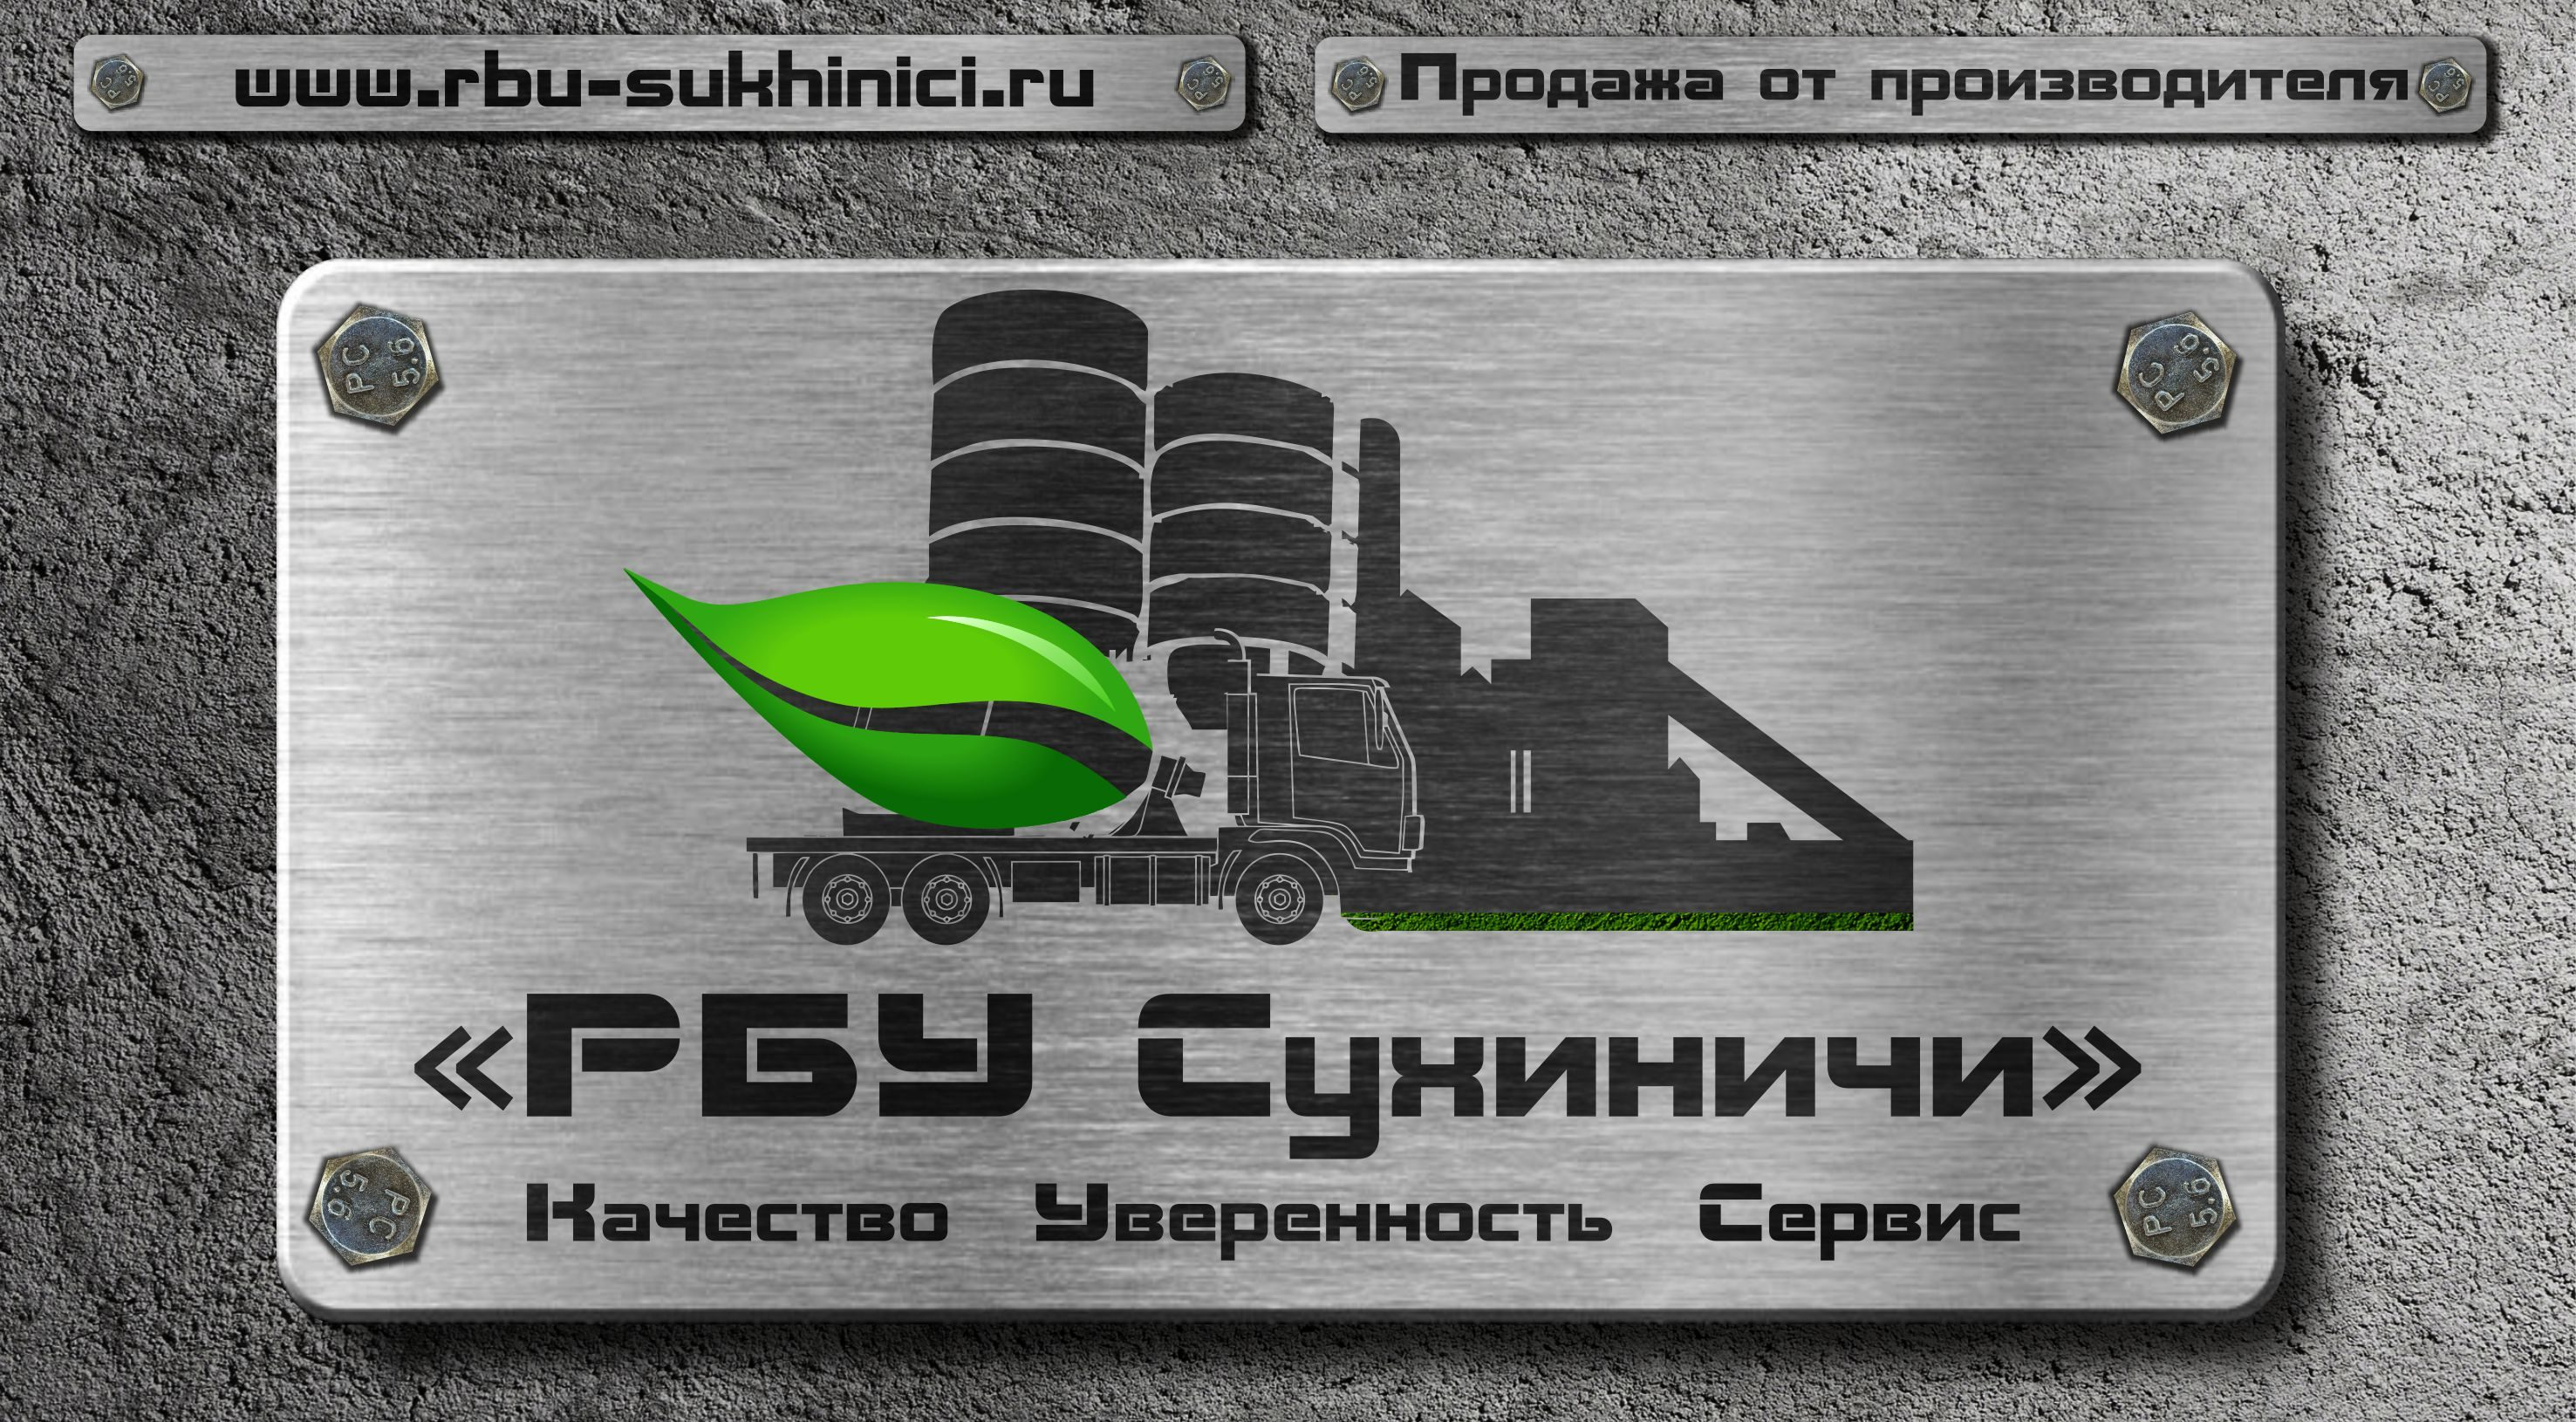 """РБУ Сухиничи"" — Купить бетон в Калуге"